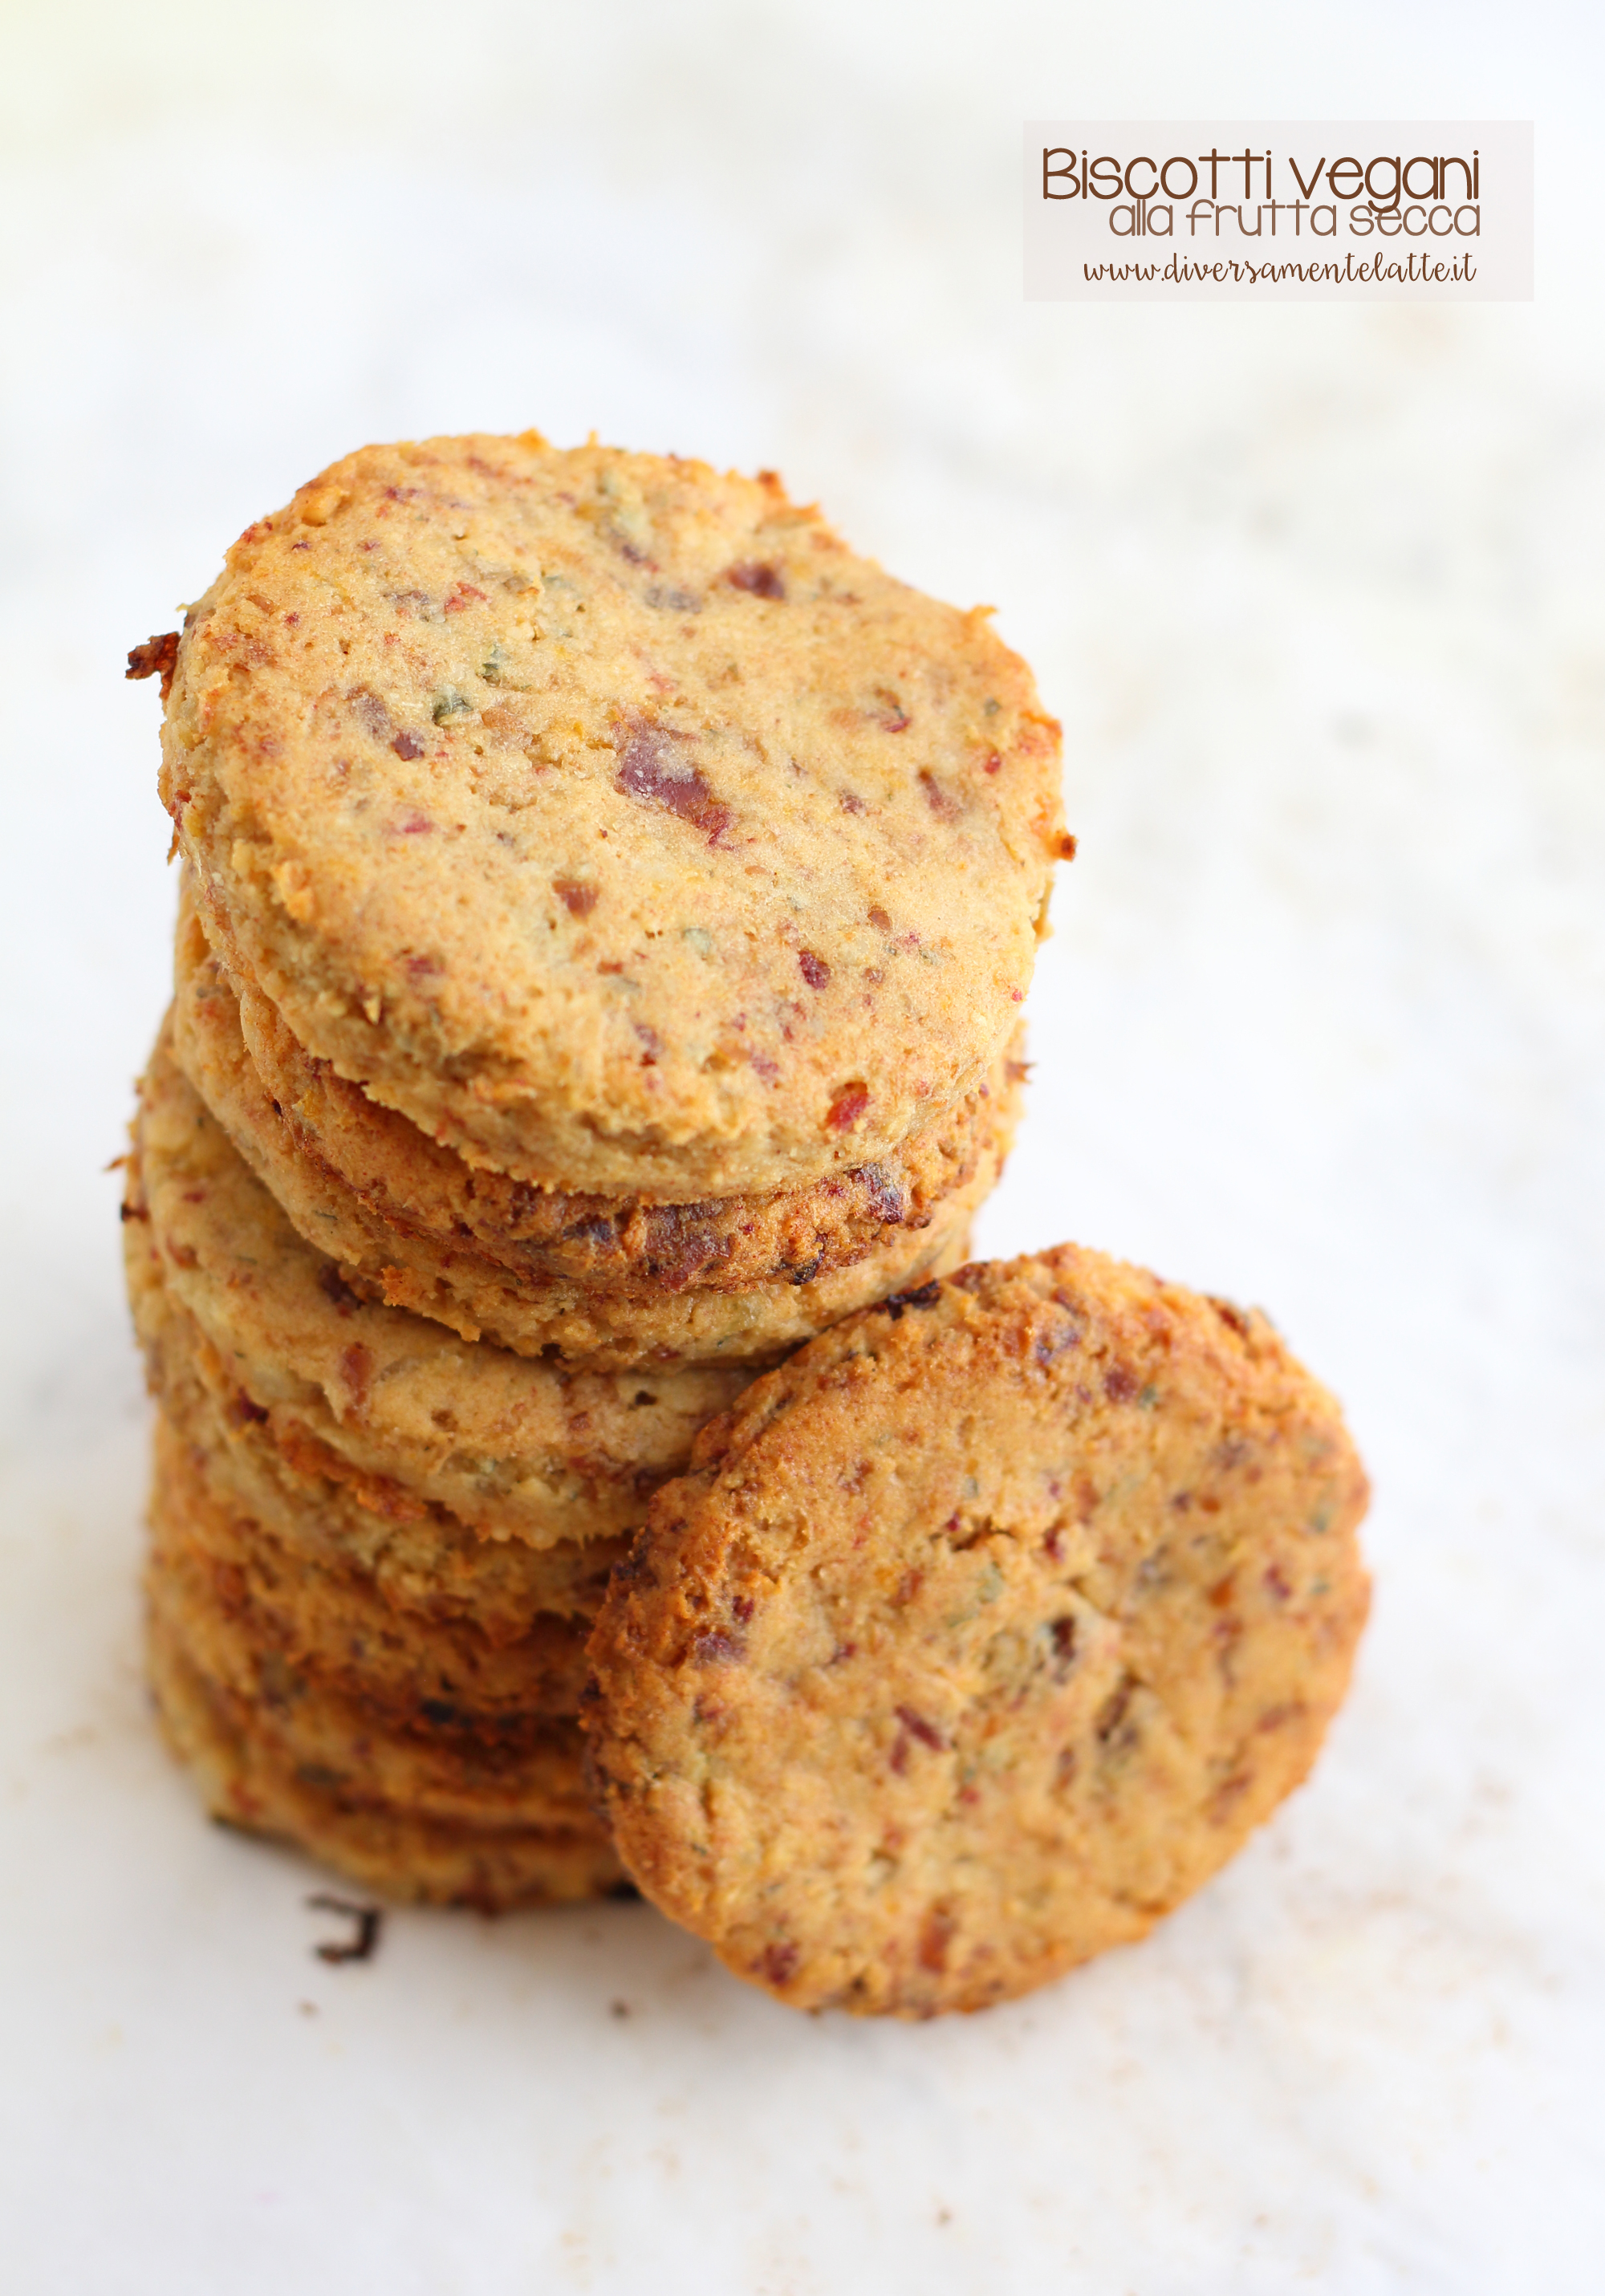 biscotti vegani senza glutine senza lattosio